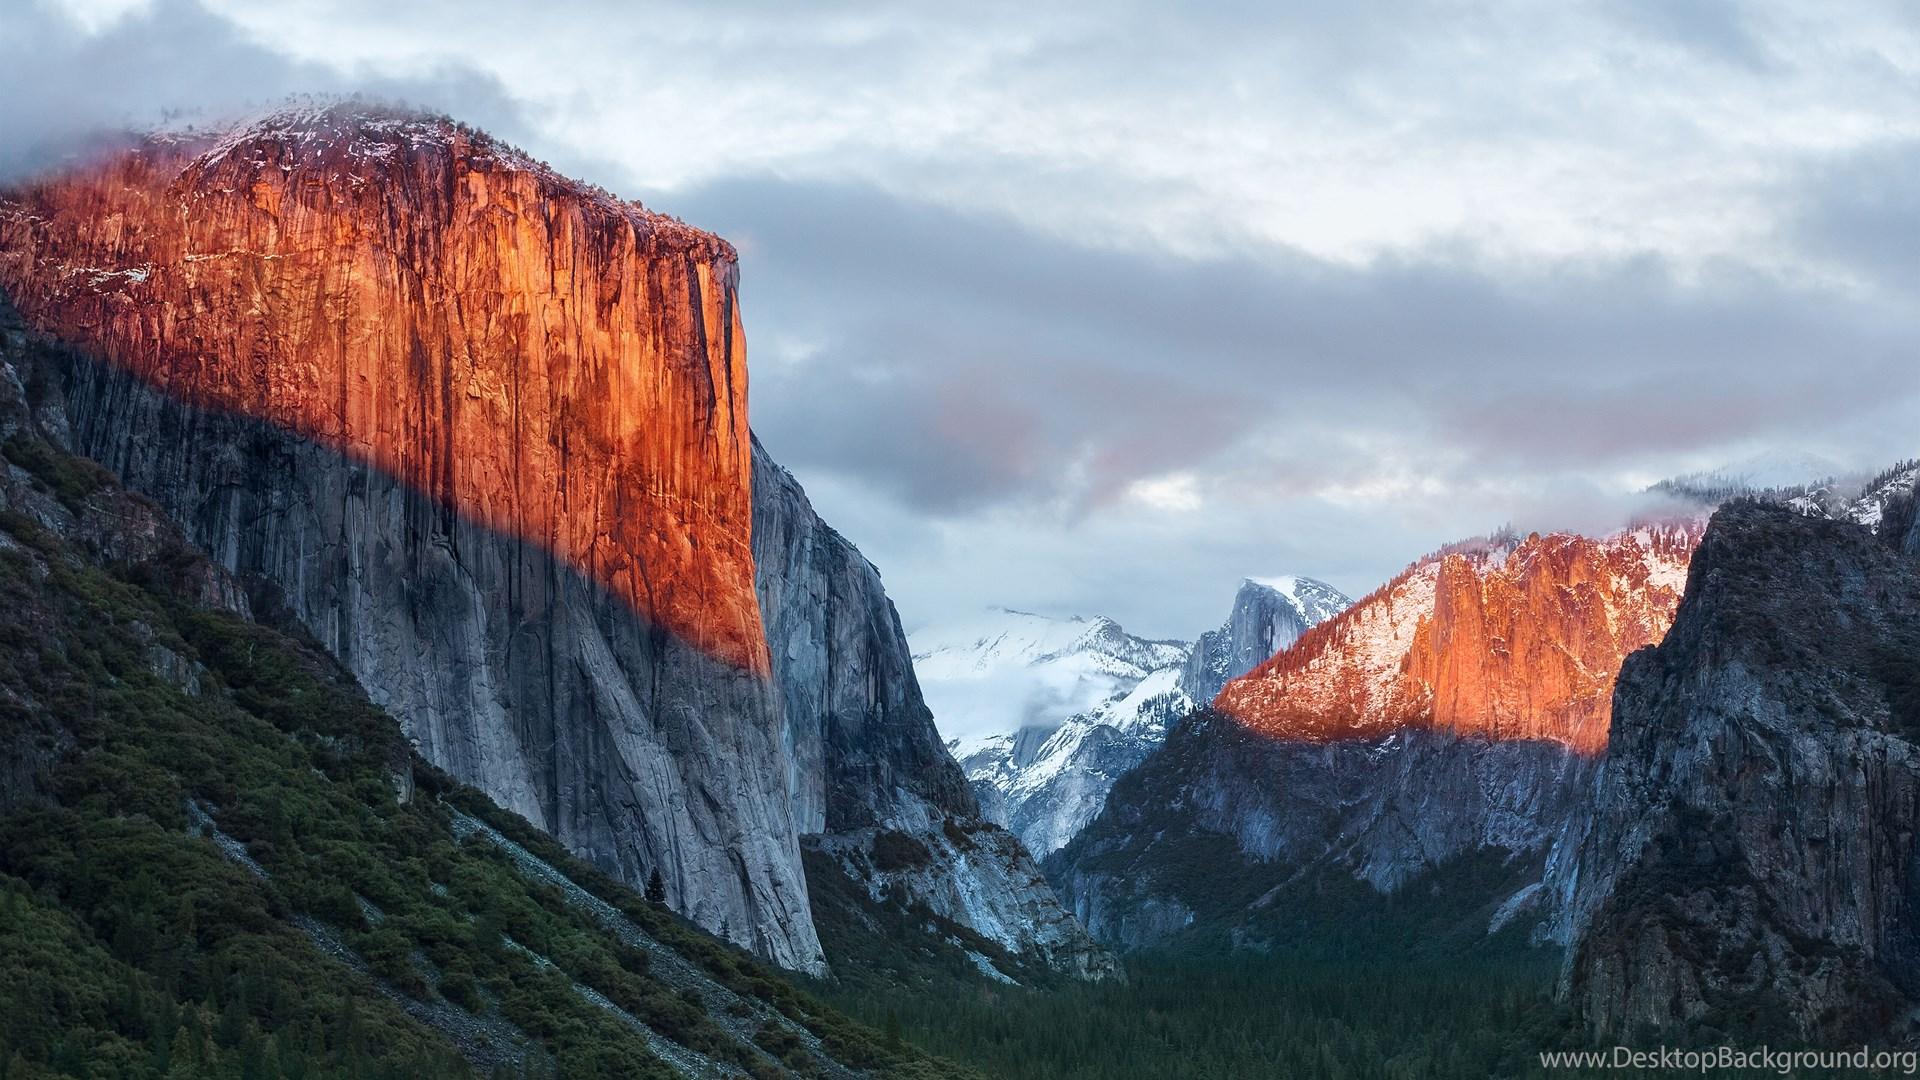 Wallpaper Apps For Ios: Download IOS 9 Wallpapers Desktop Background